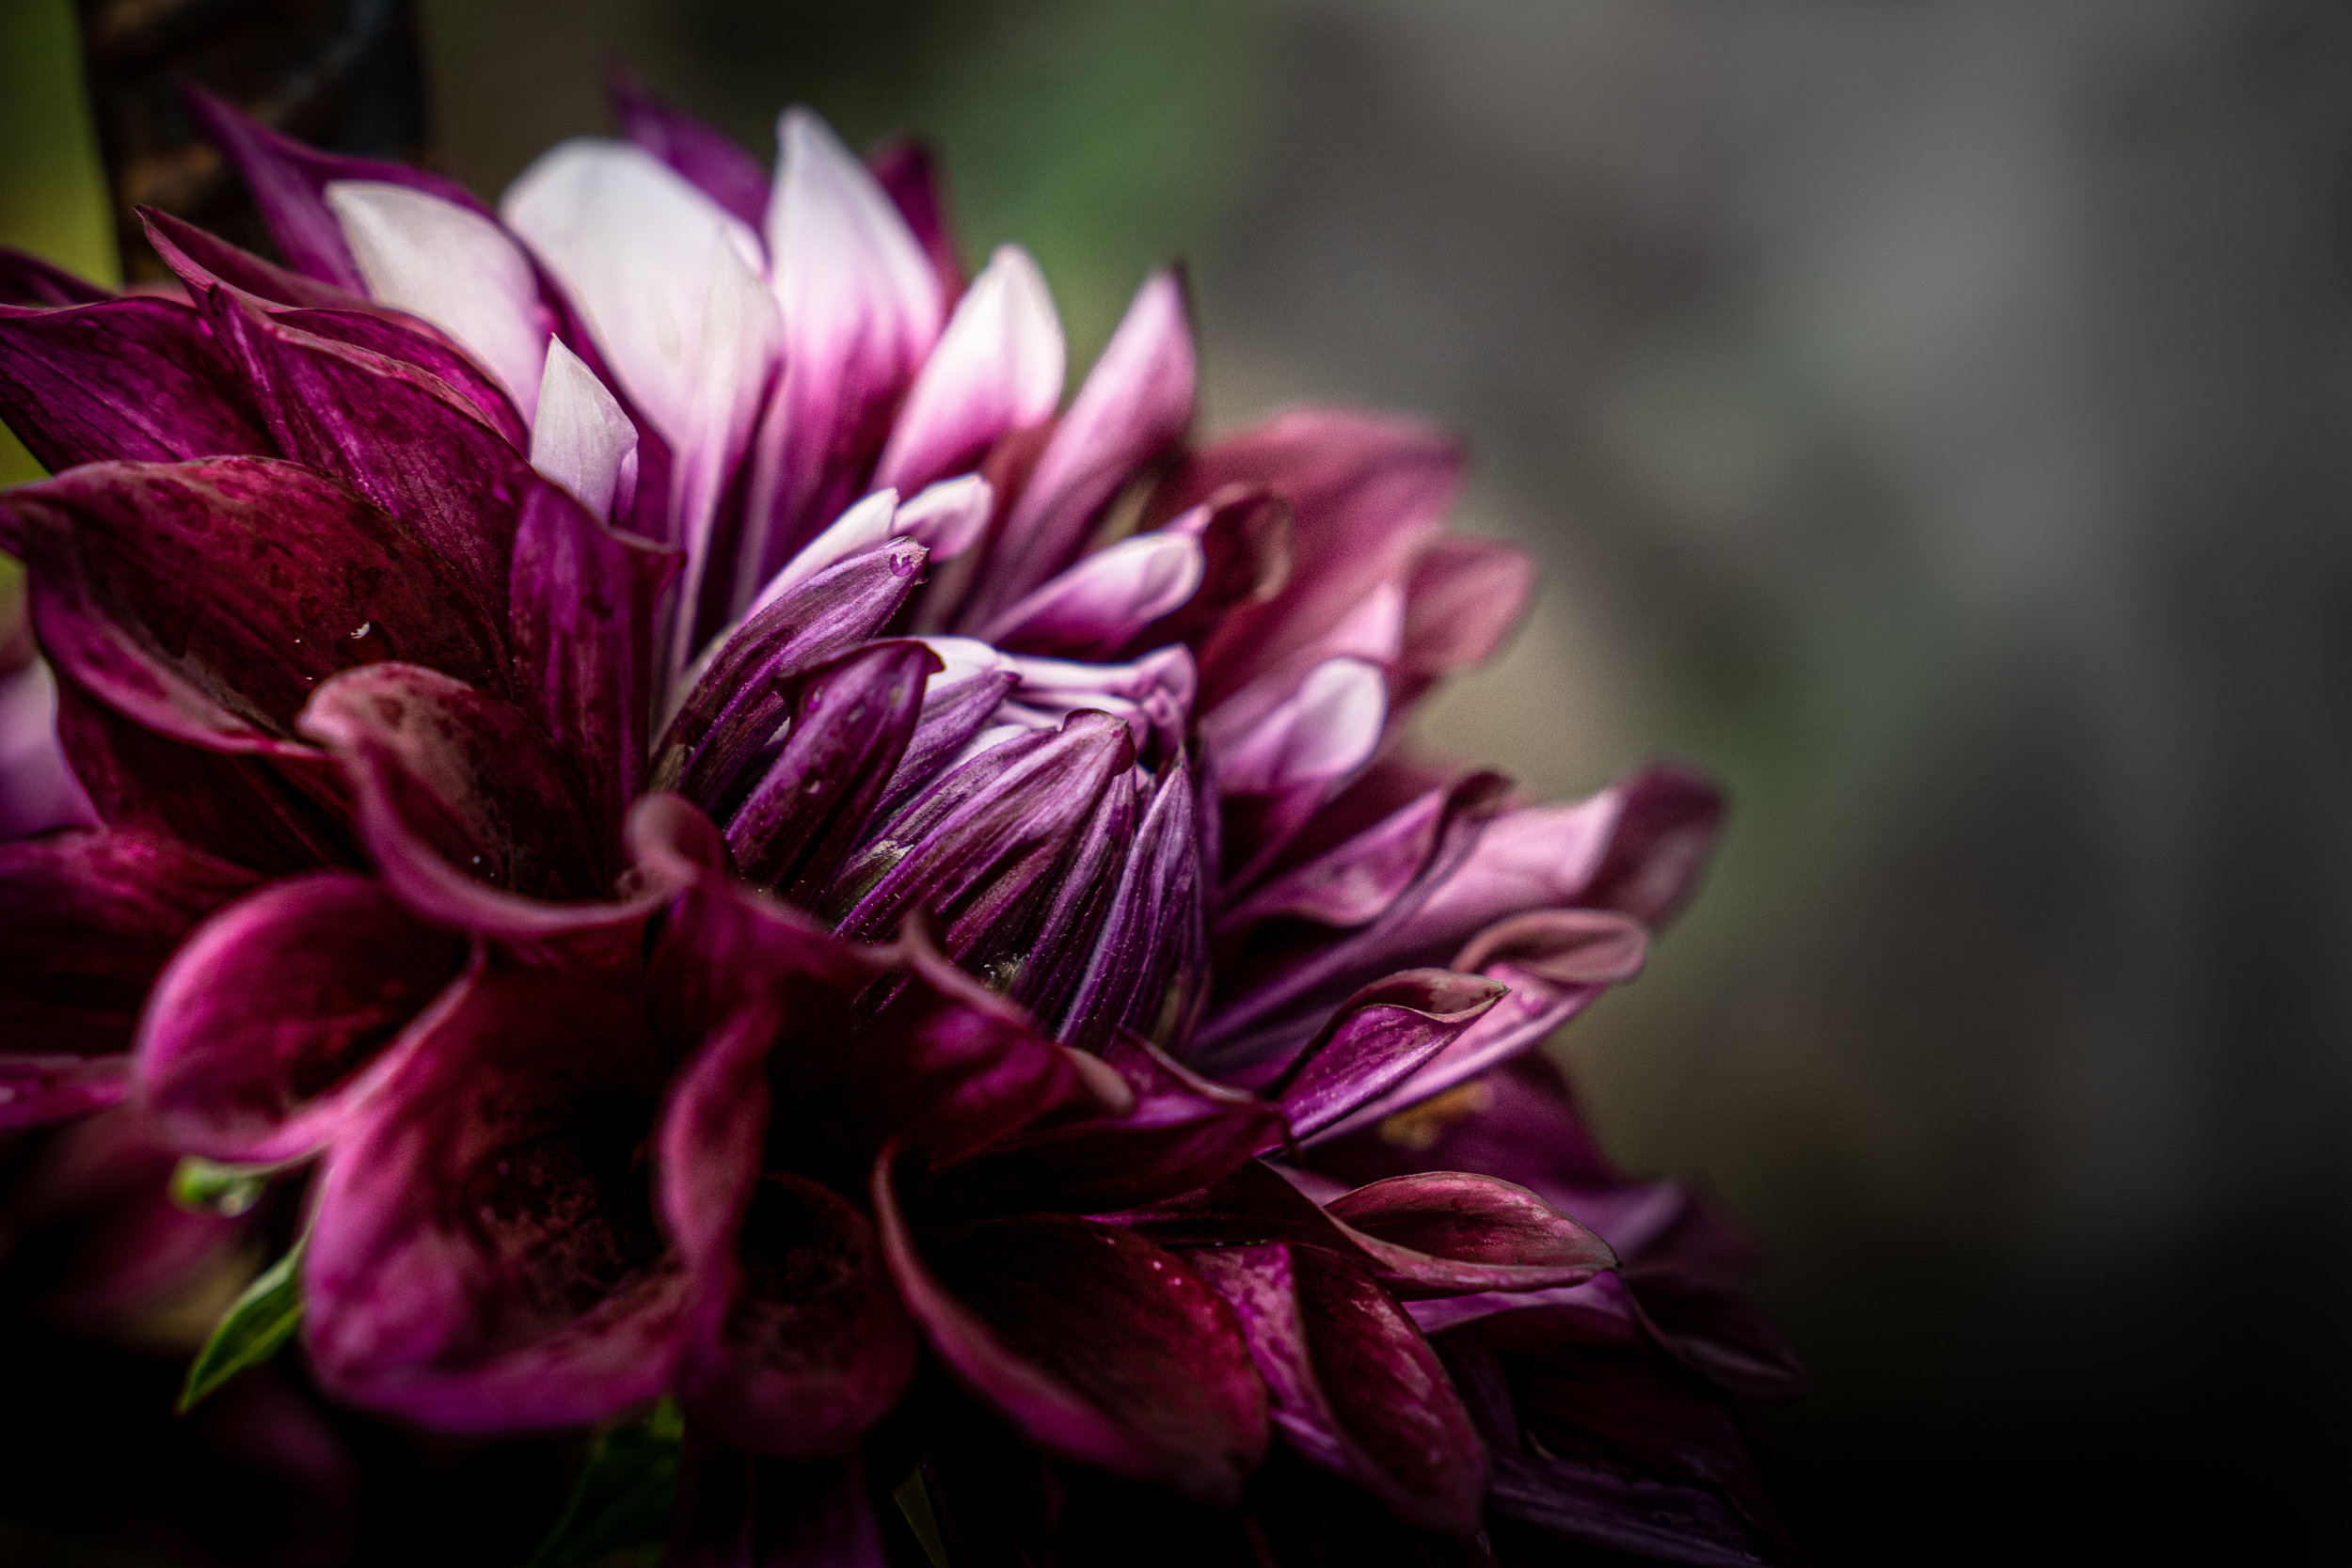 07-02-19-Lilies and Dahlias-7.jpg